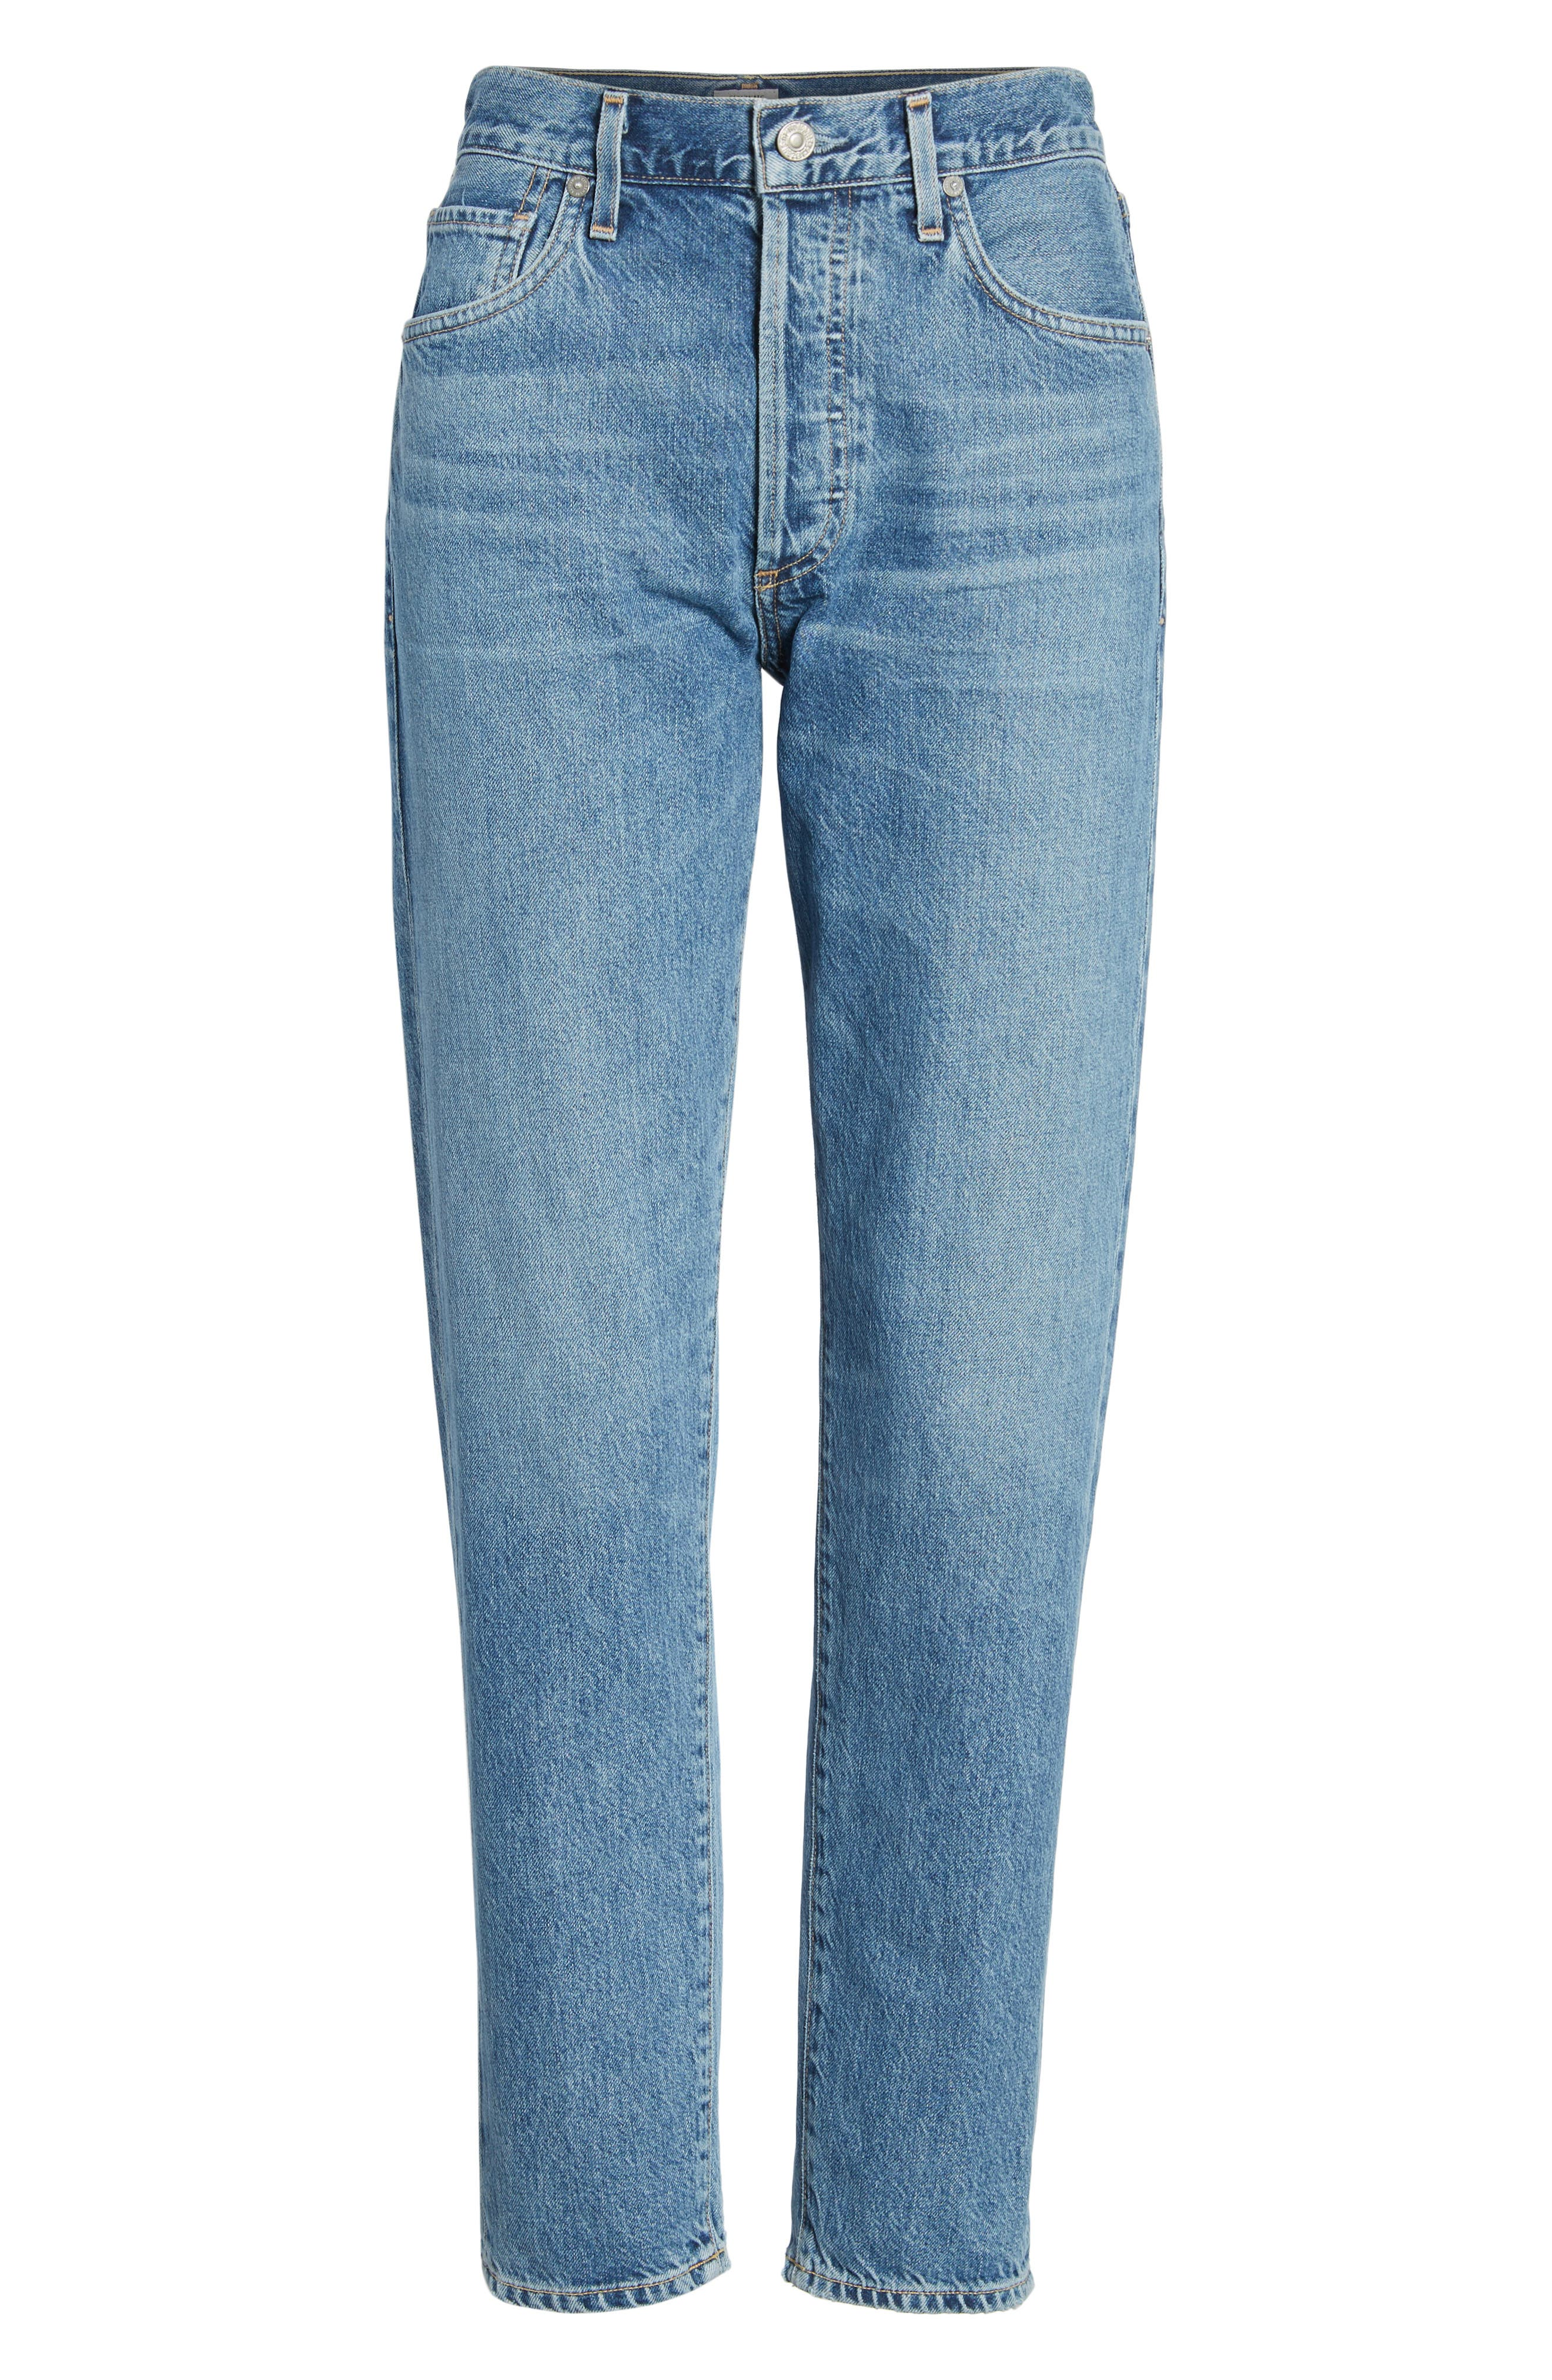 Liya High Waist Slim Boyfriend Jeans,                             Alternate thumbnail 7, color,                             Admire